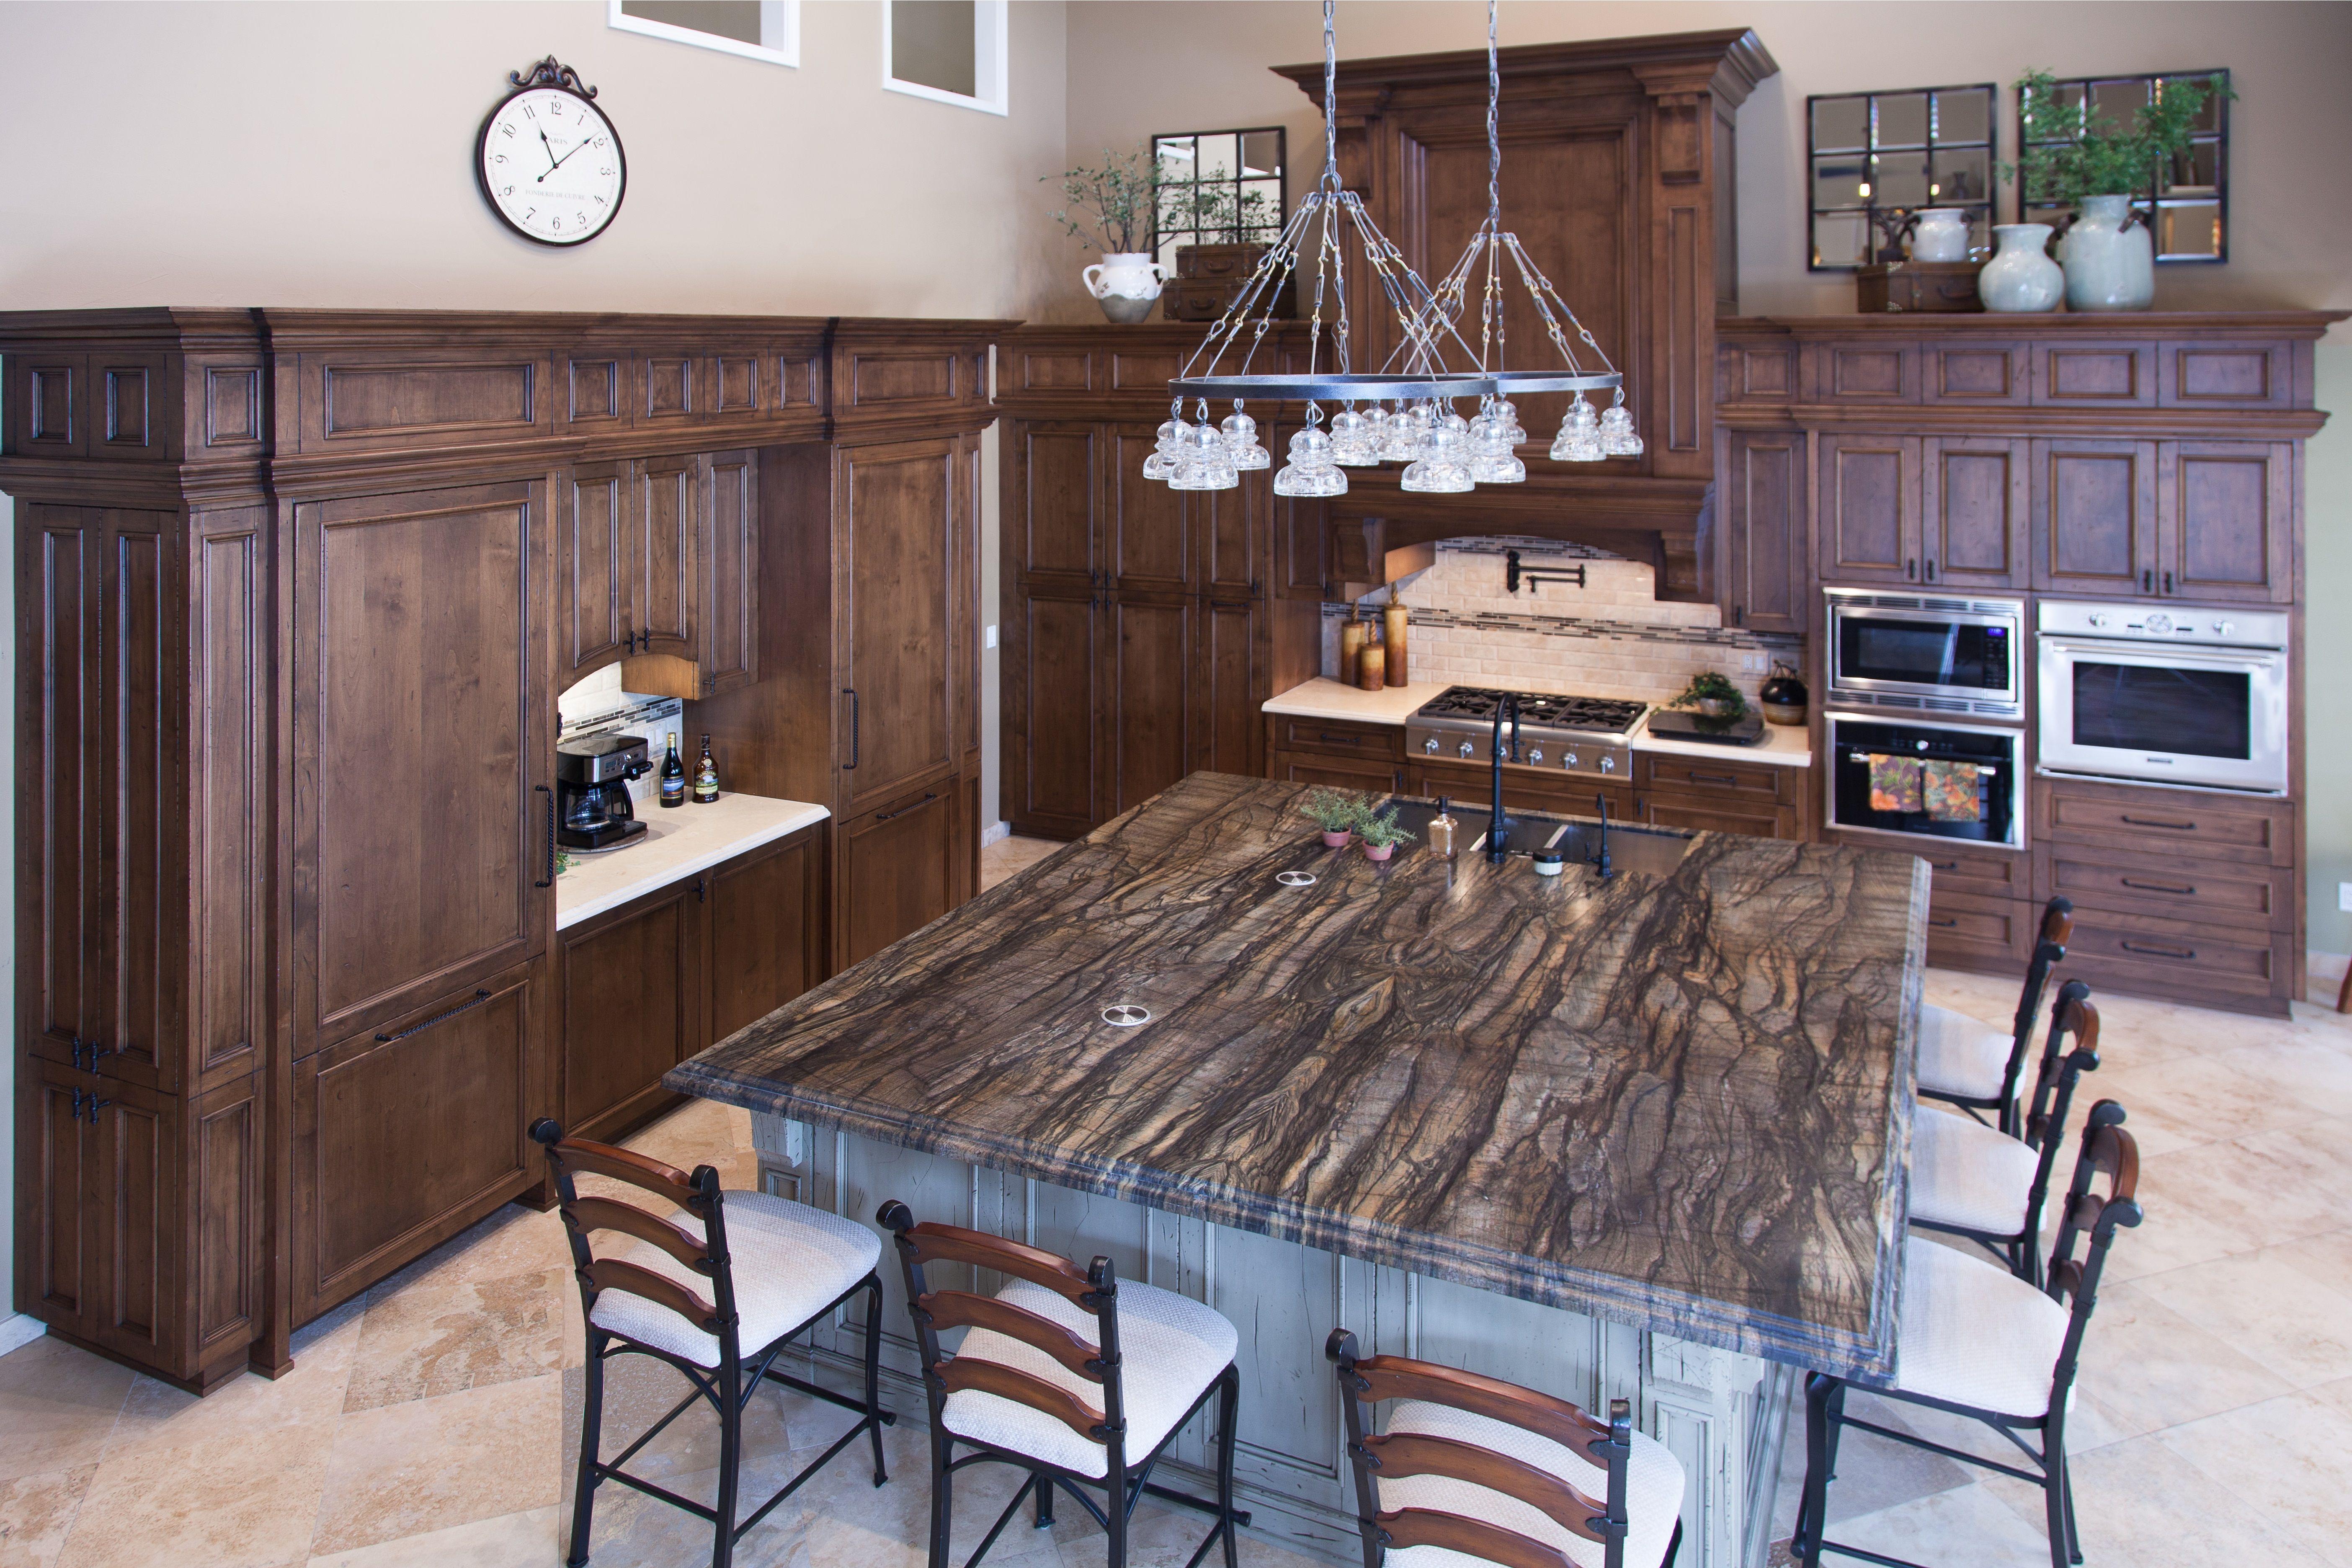 Kitchen remodel in Scottsdale, Arizona. Kitchen remodel